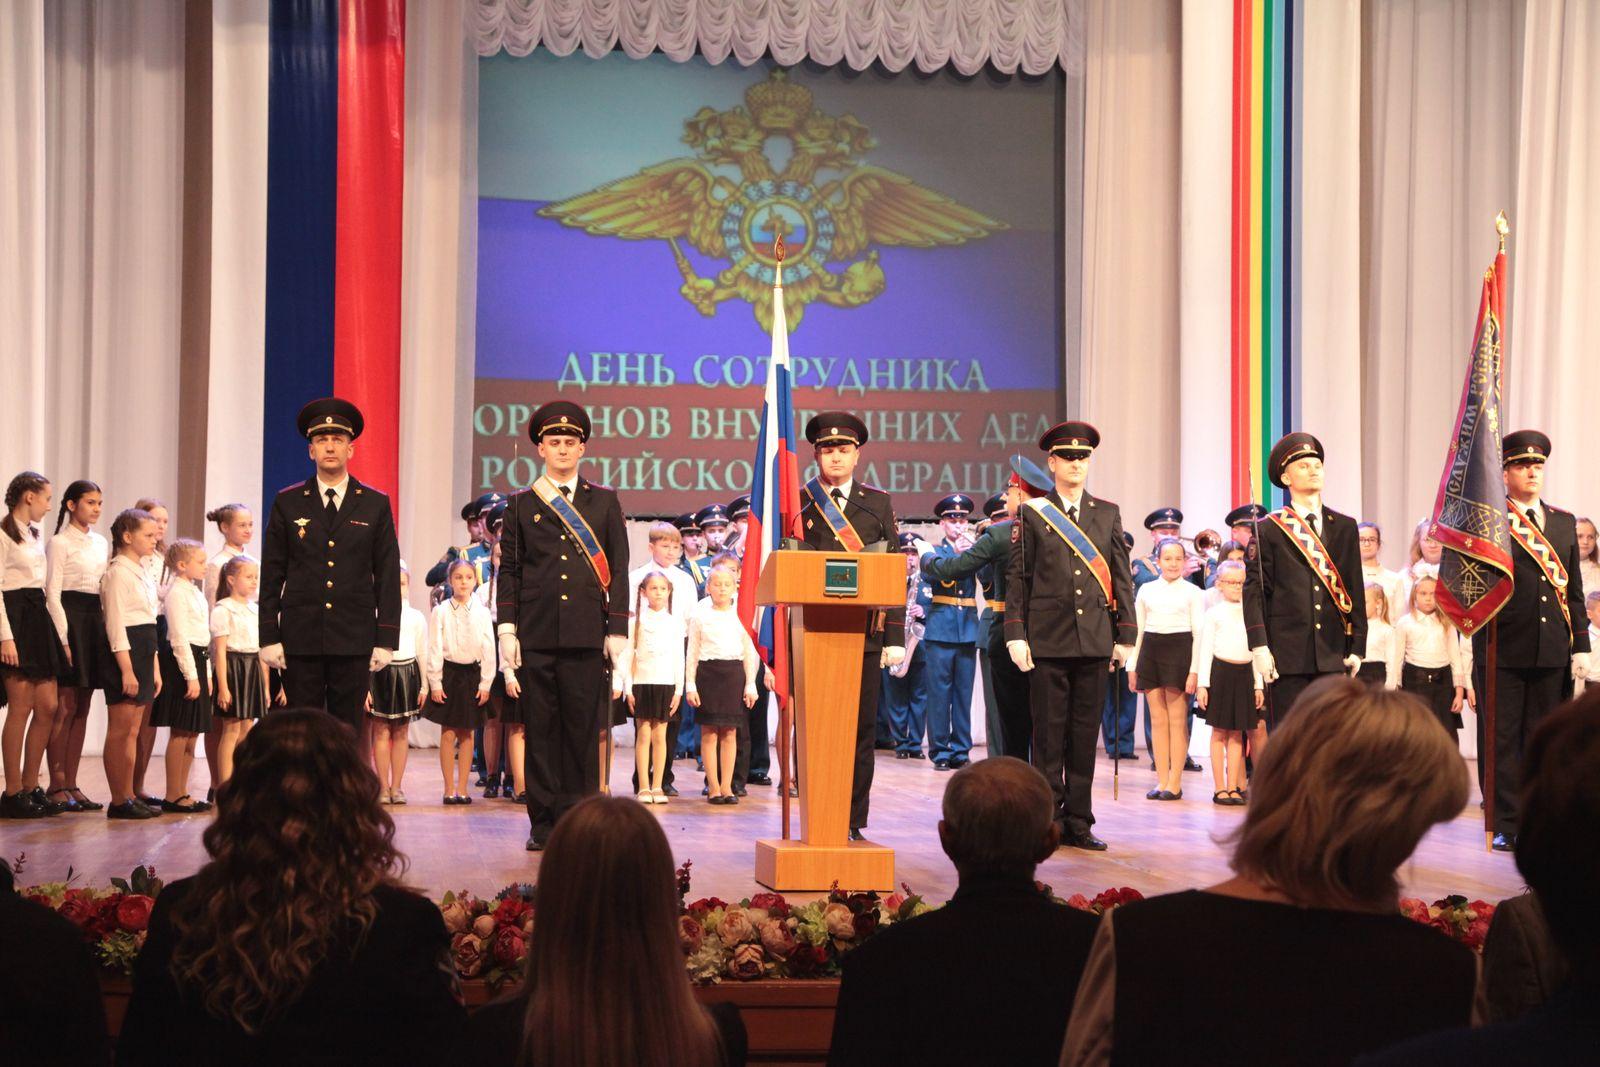 Сотрудникам полиции вручили награды парламента ЕАО